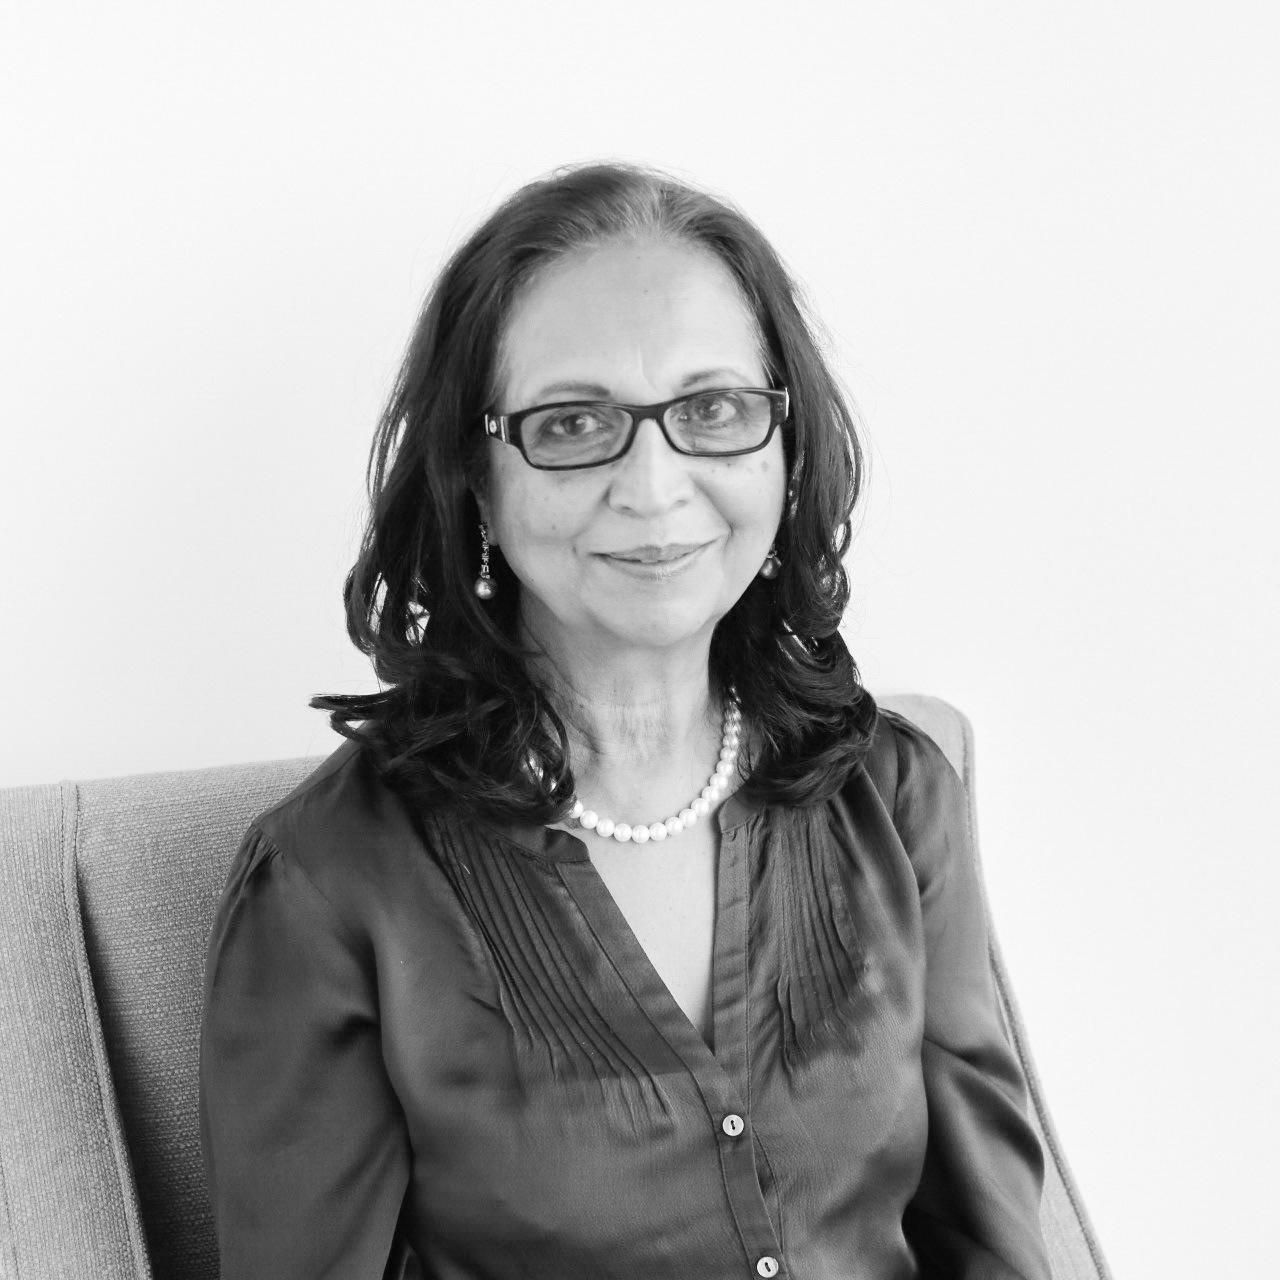 Anji Patel